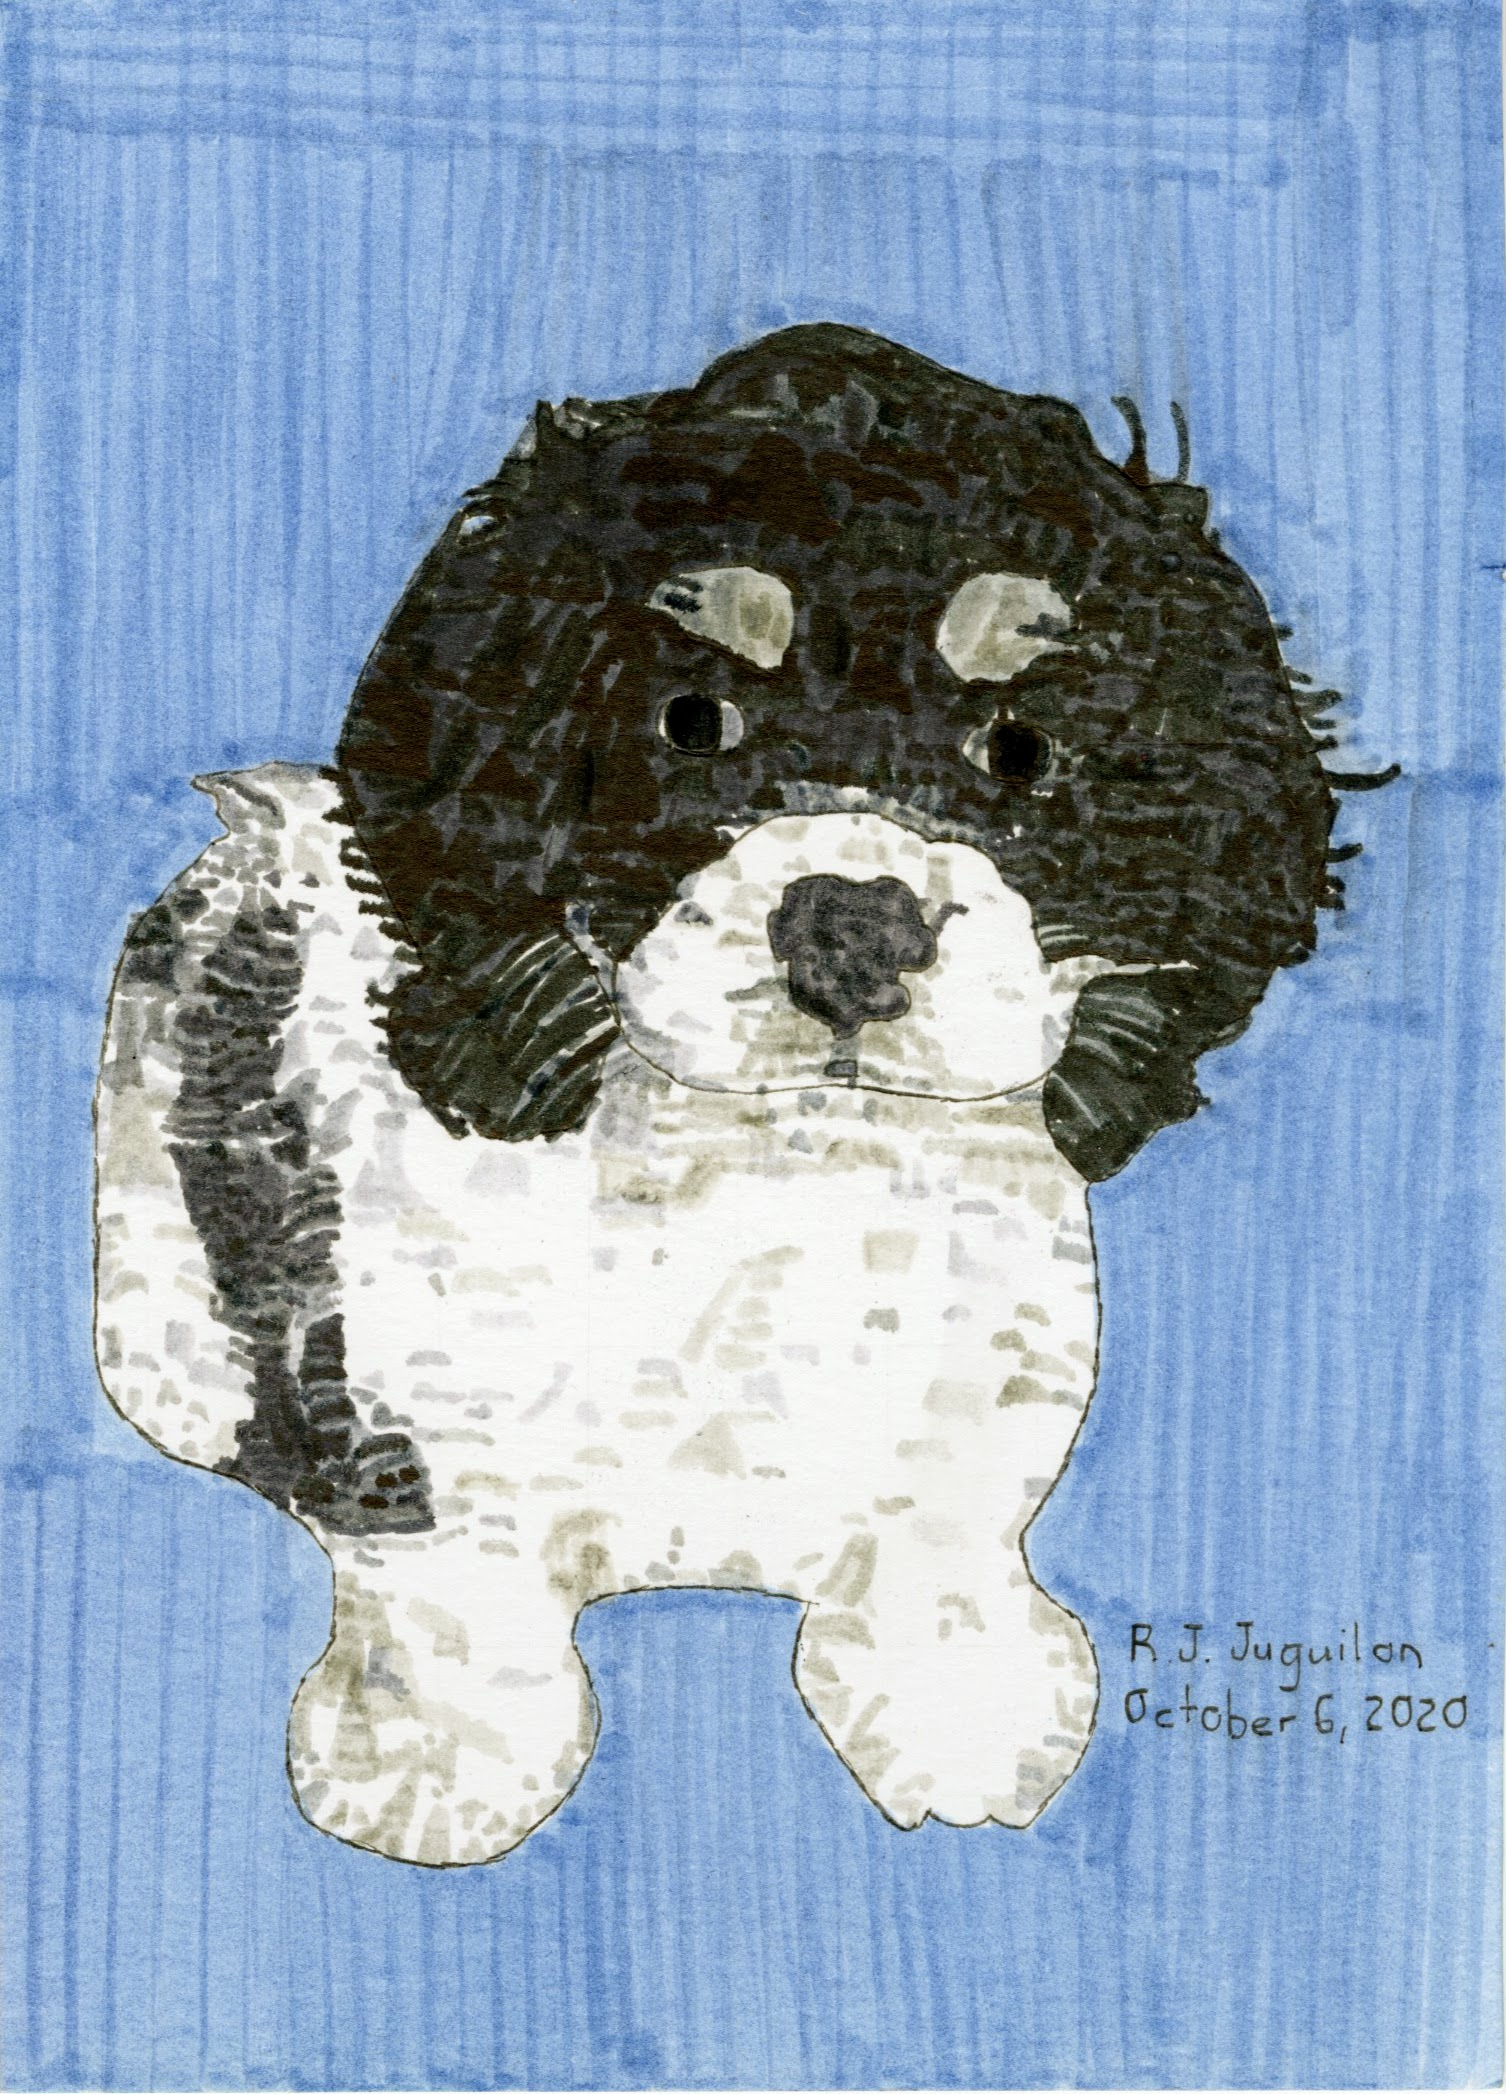 """Cocker Spaniel Puppy"" by RJ Juguilon"